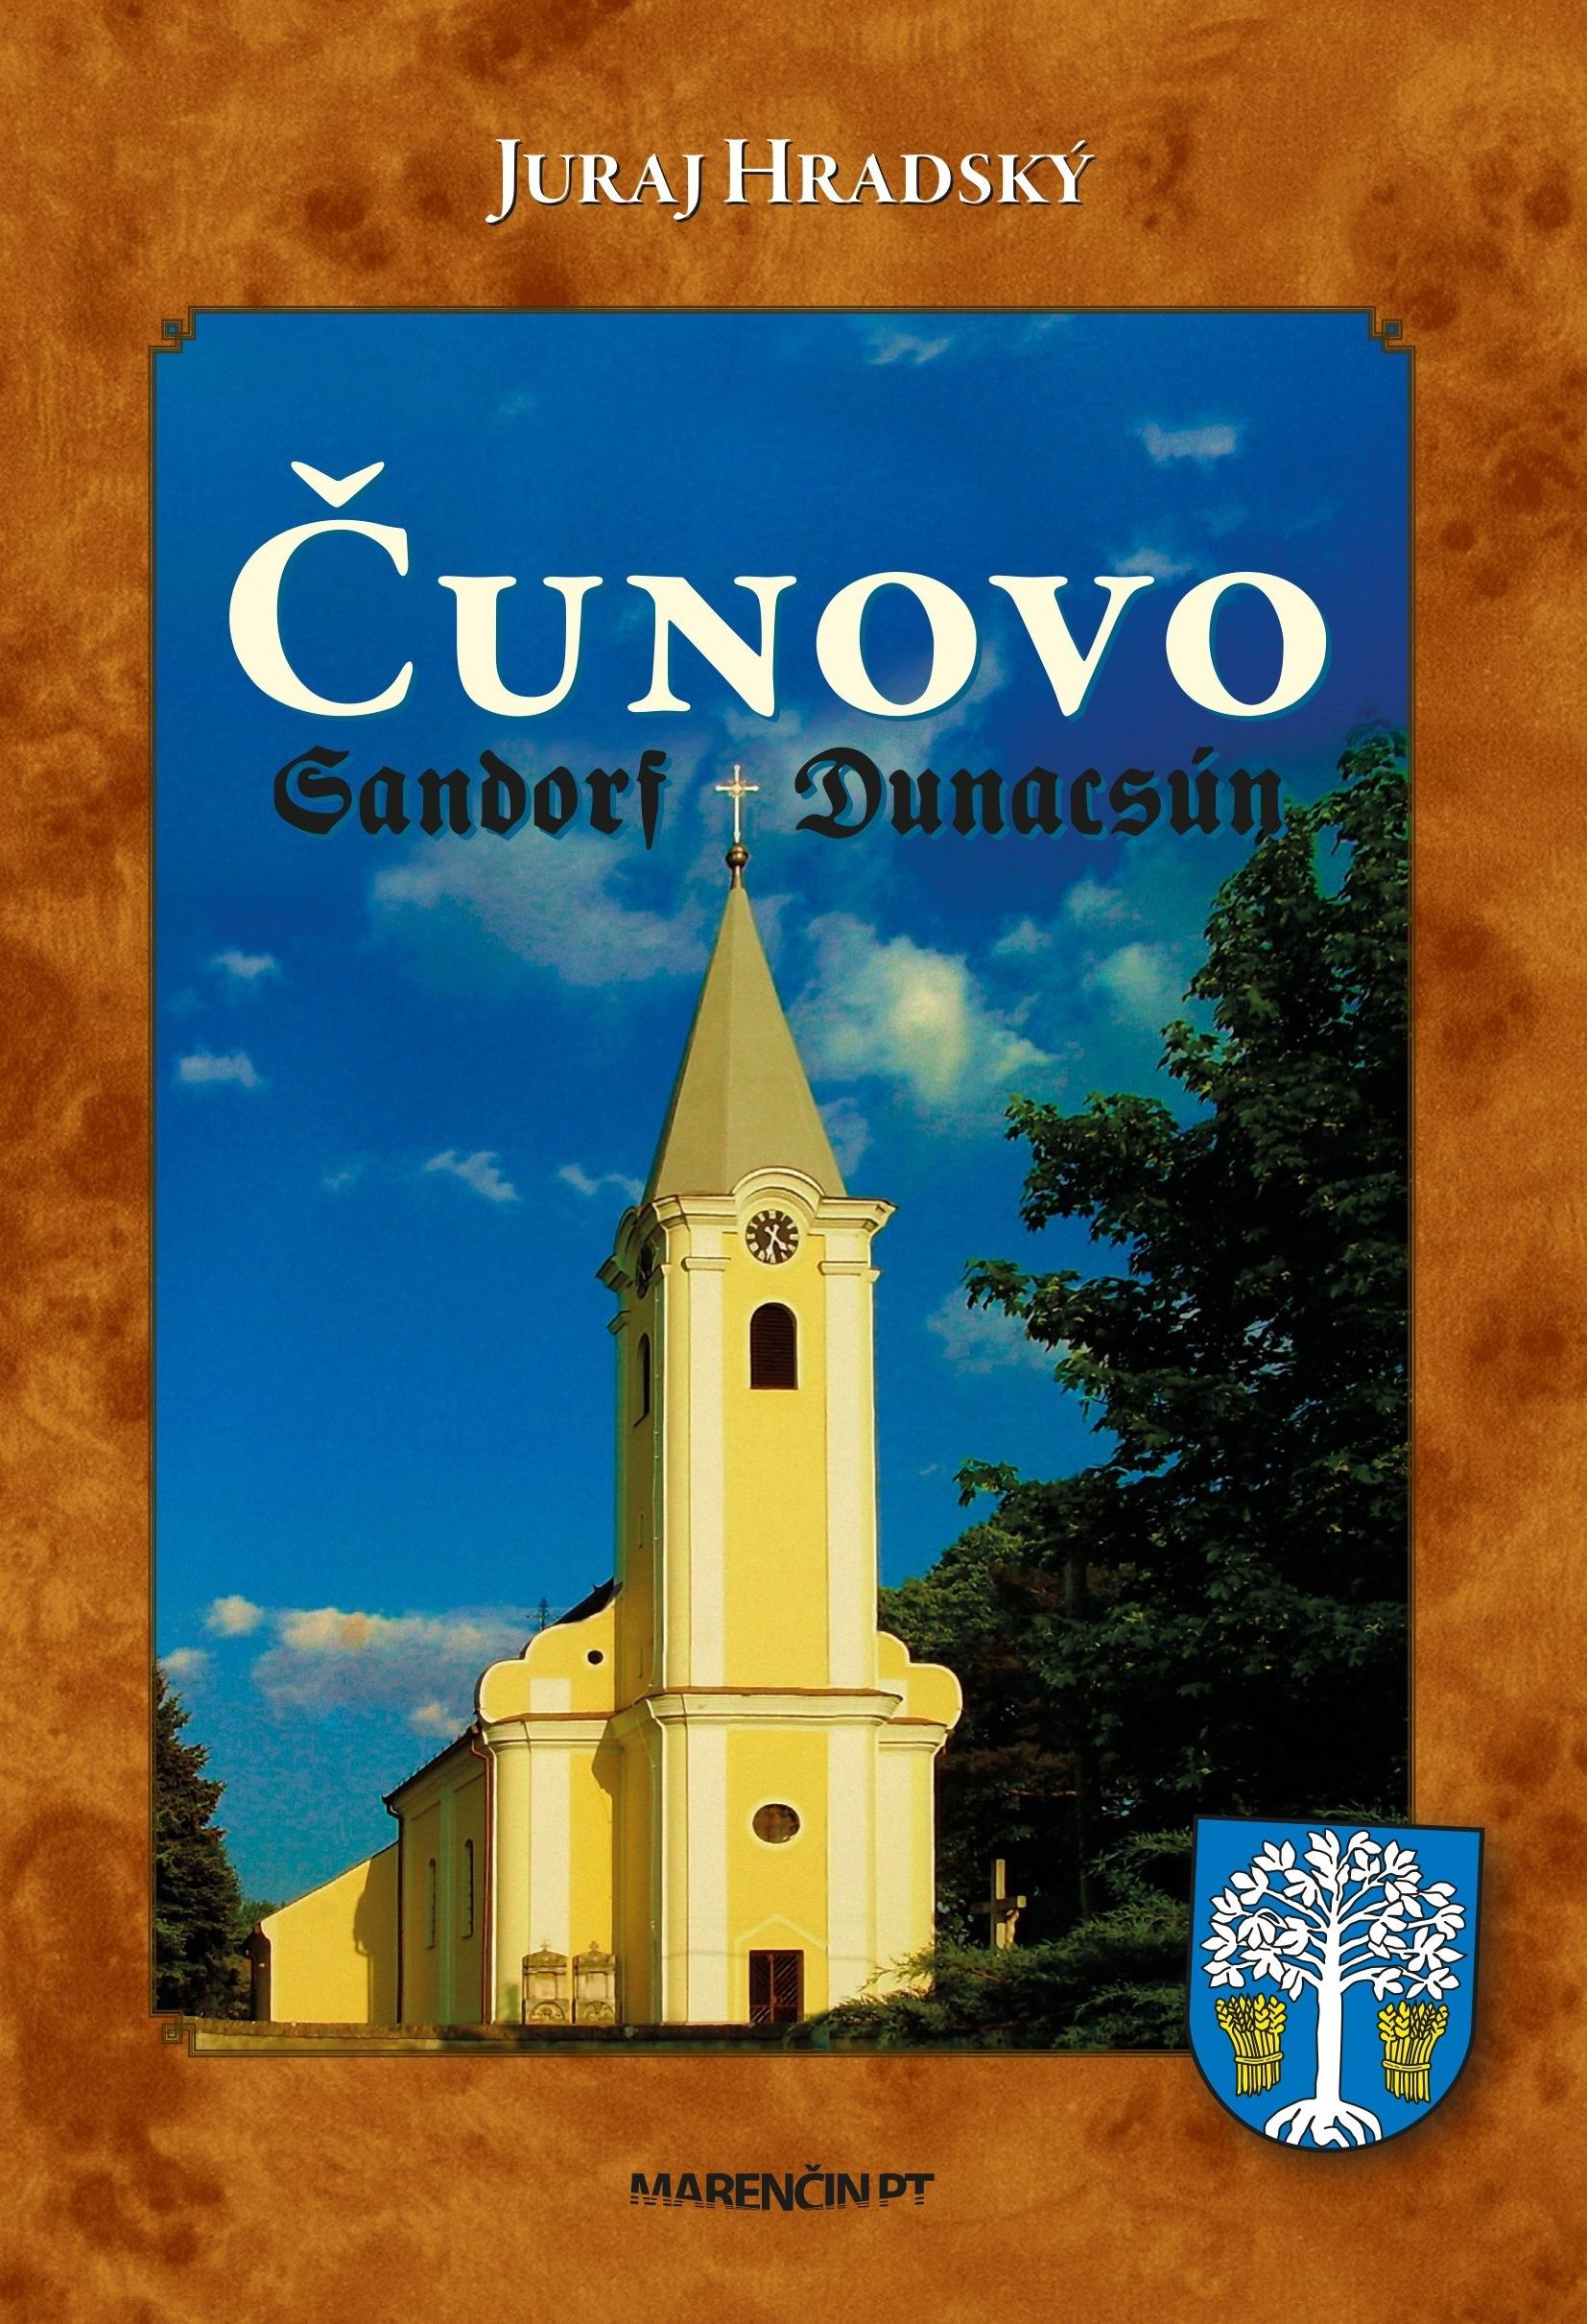 Čunovo - Sarndorf Dunacsún